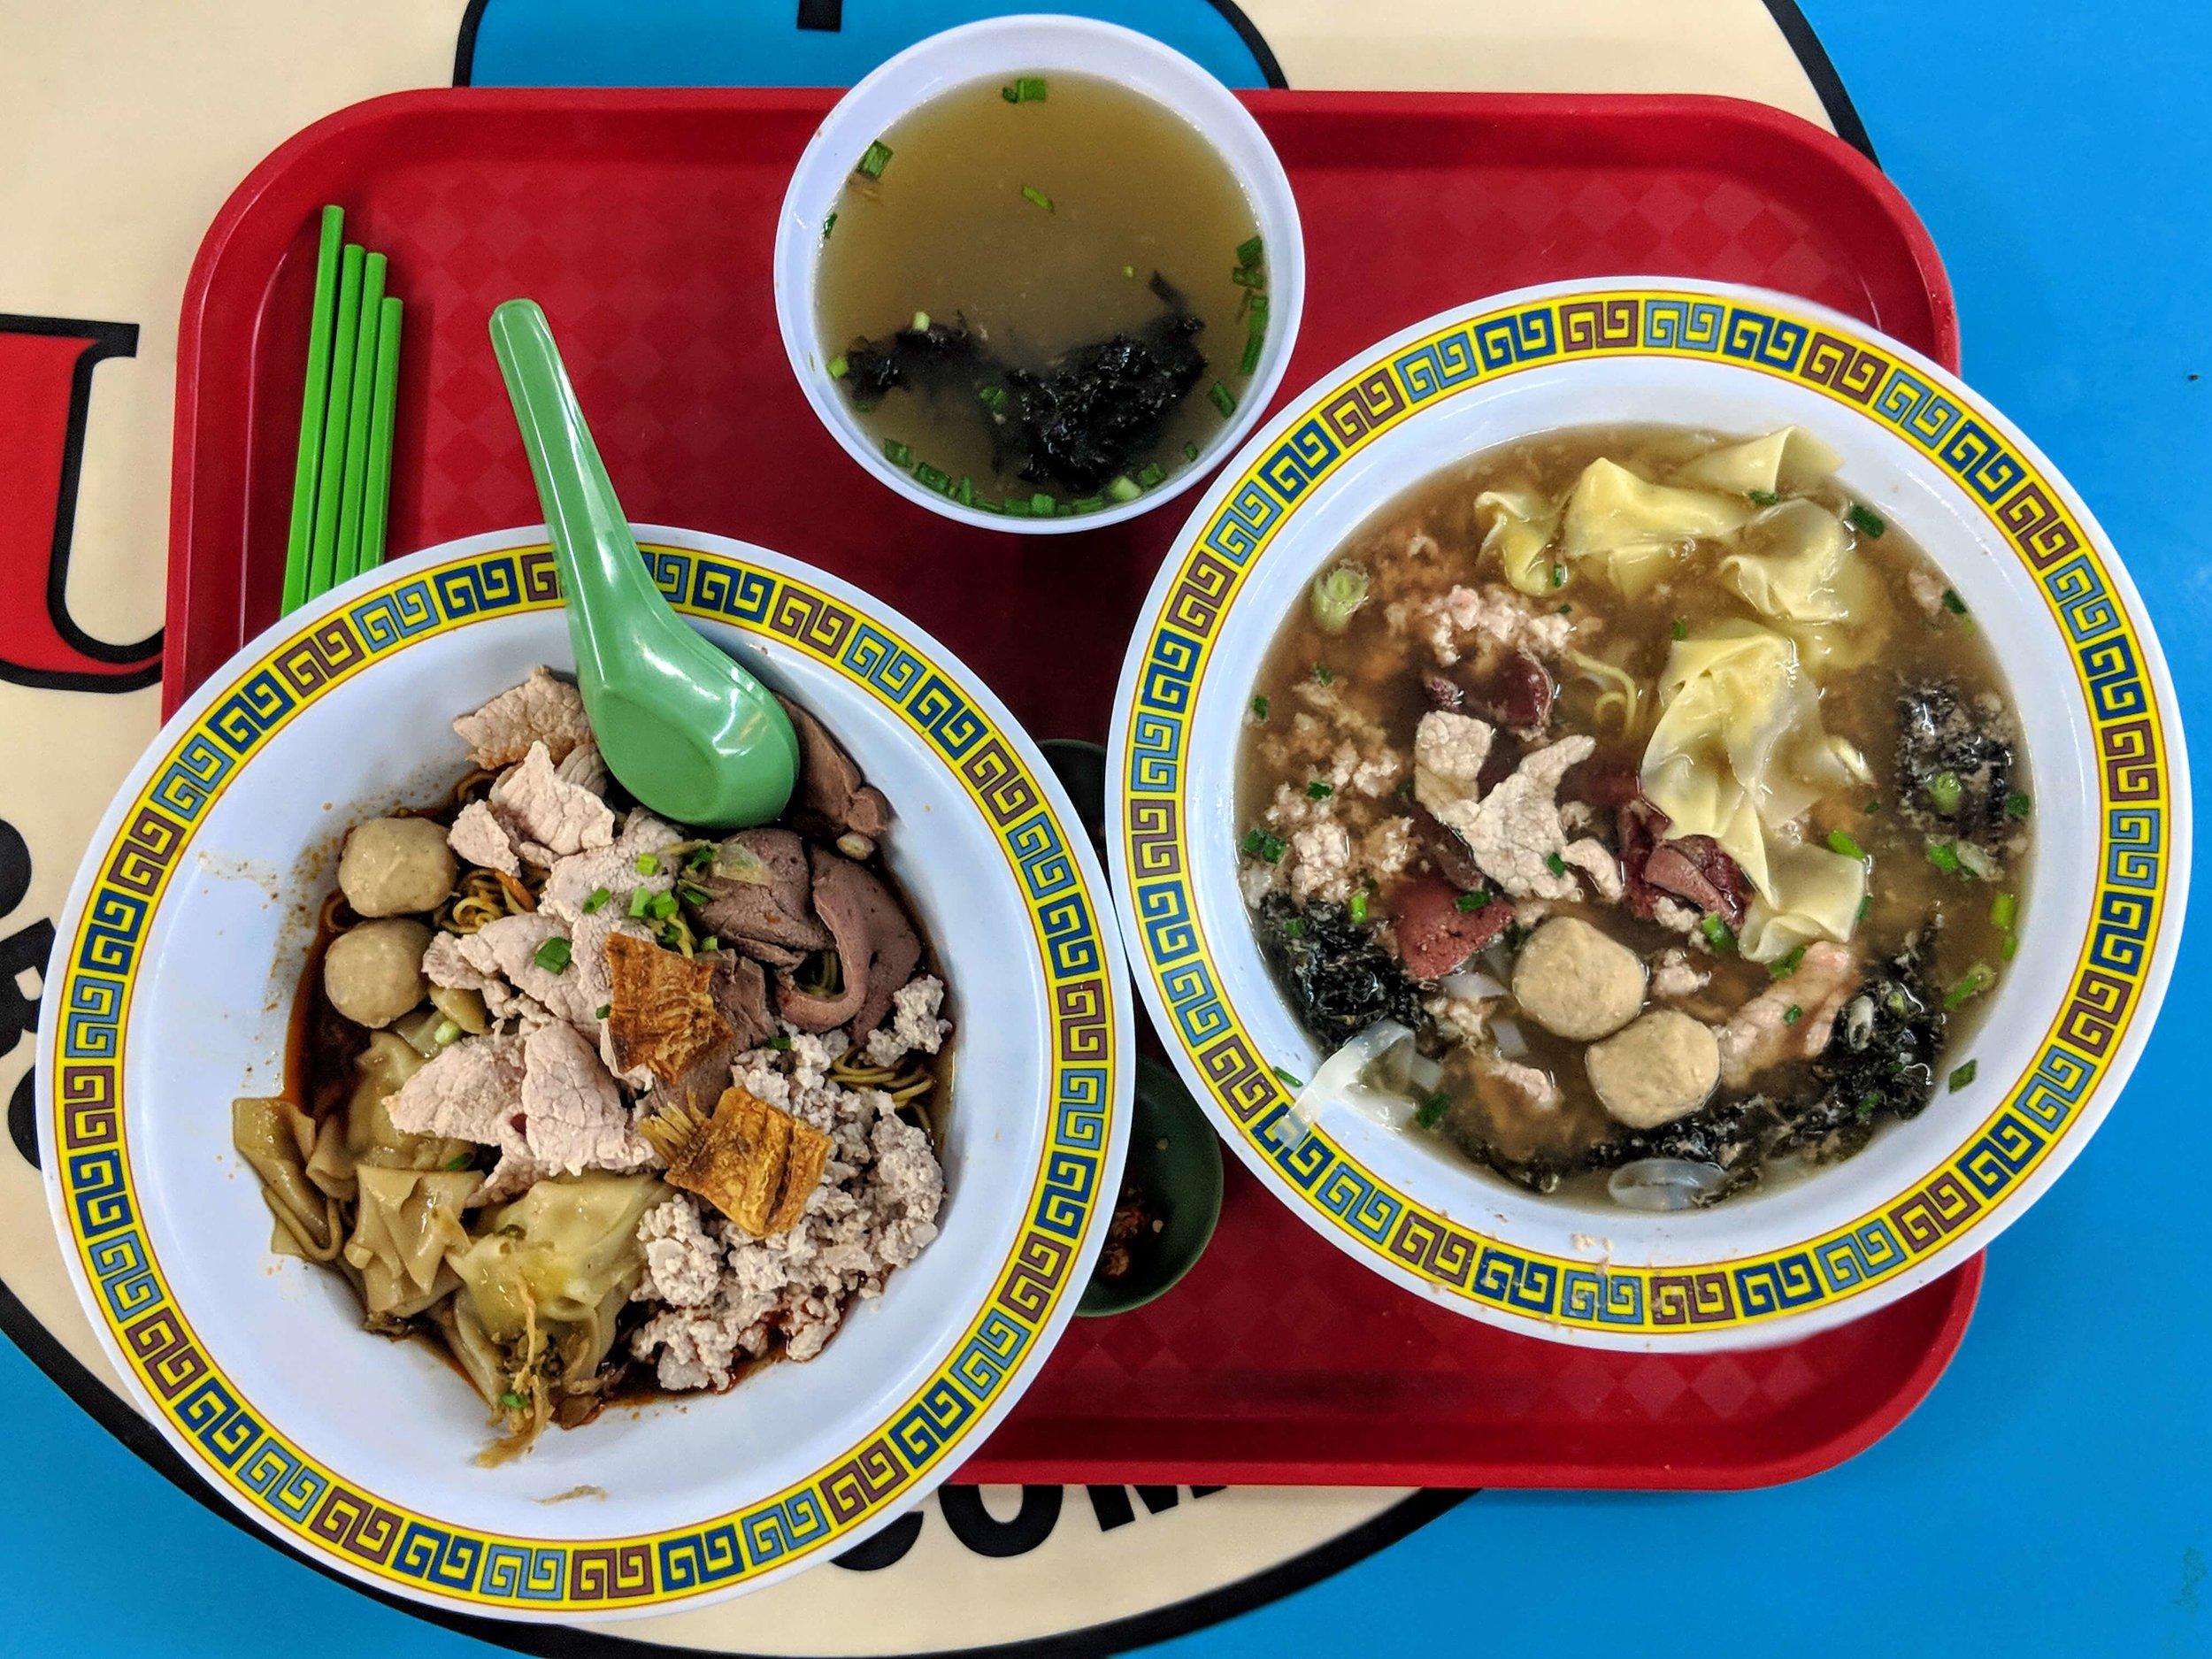 Hill Street Tai Hwa Pork Noodles, Singapore